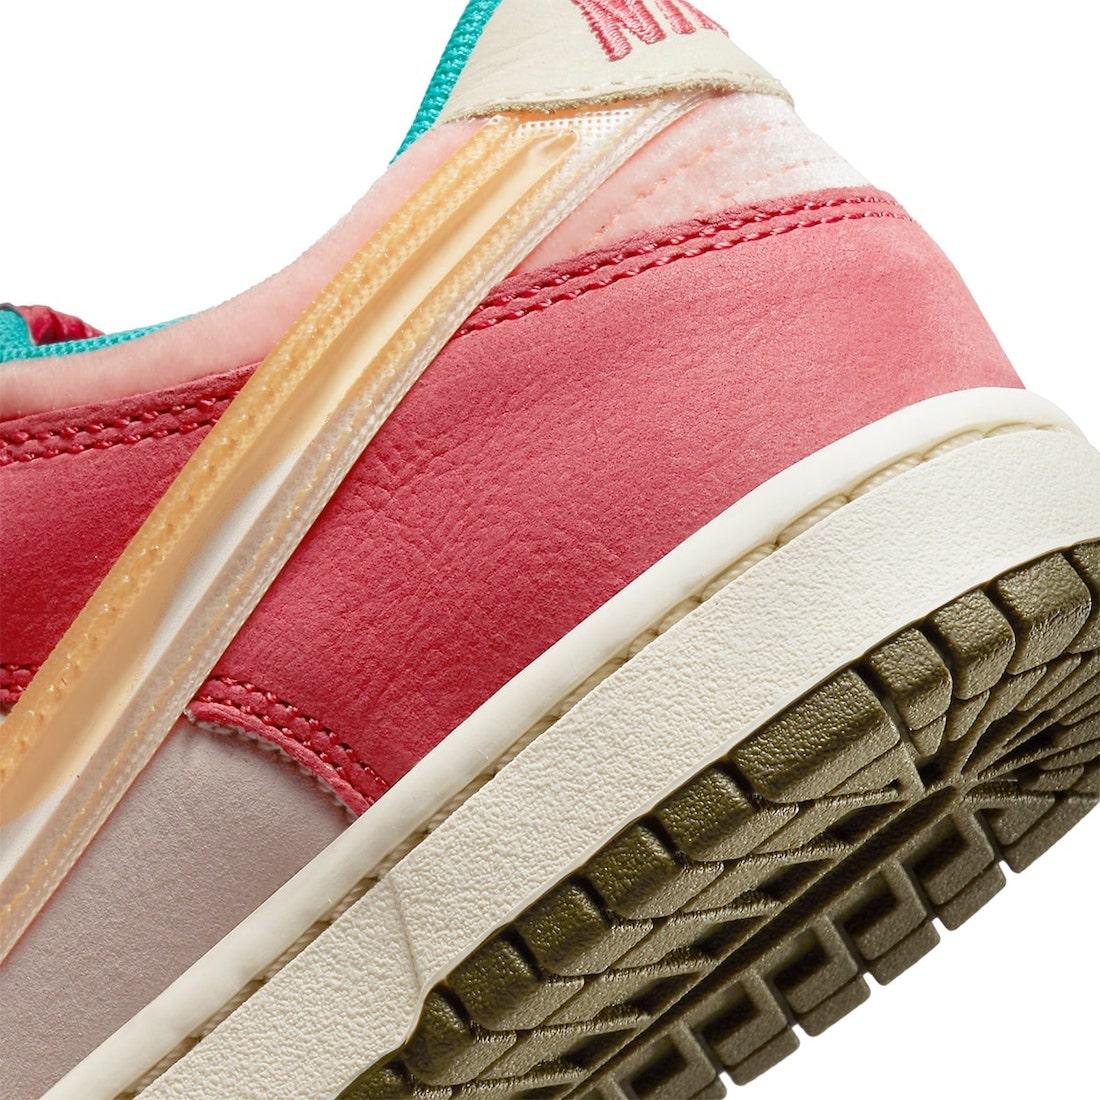 Swoosh, Social Status x Nike Dunk Low, Nike Dunk Low, Nike Dunk, NIKE, Dunk